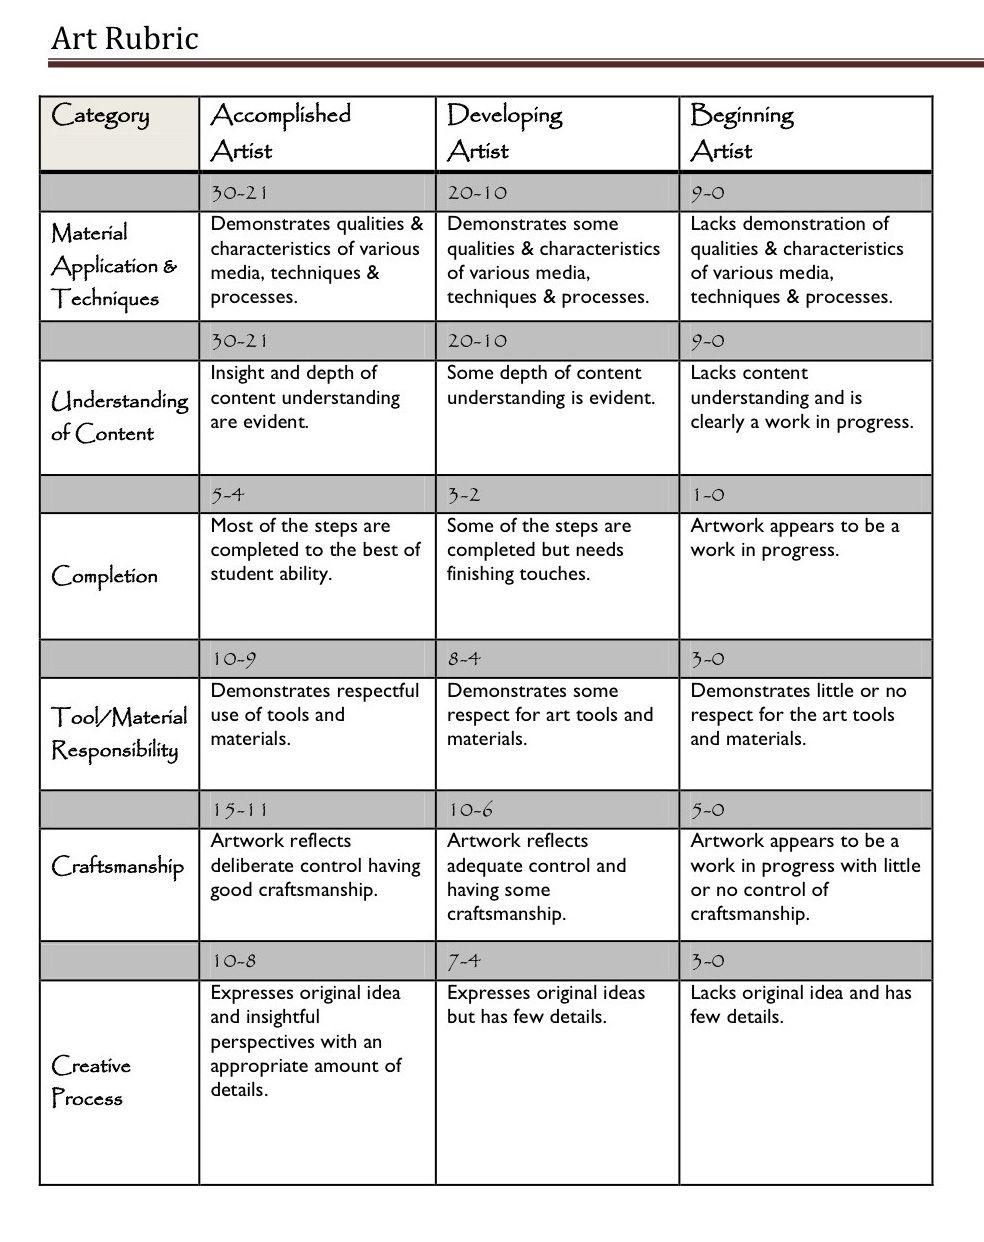 A Handy Rubric For Art Teachers | Assessment Tools & Ideas - Free Printable Art Rubrics